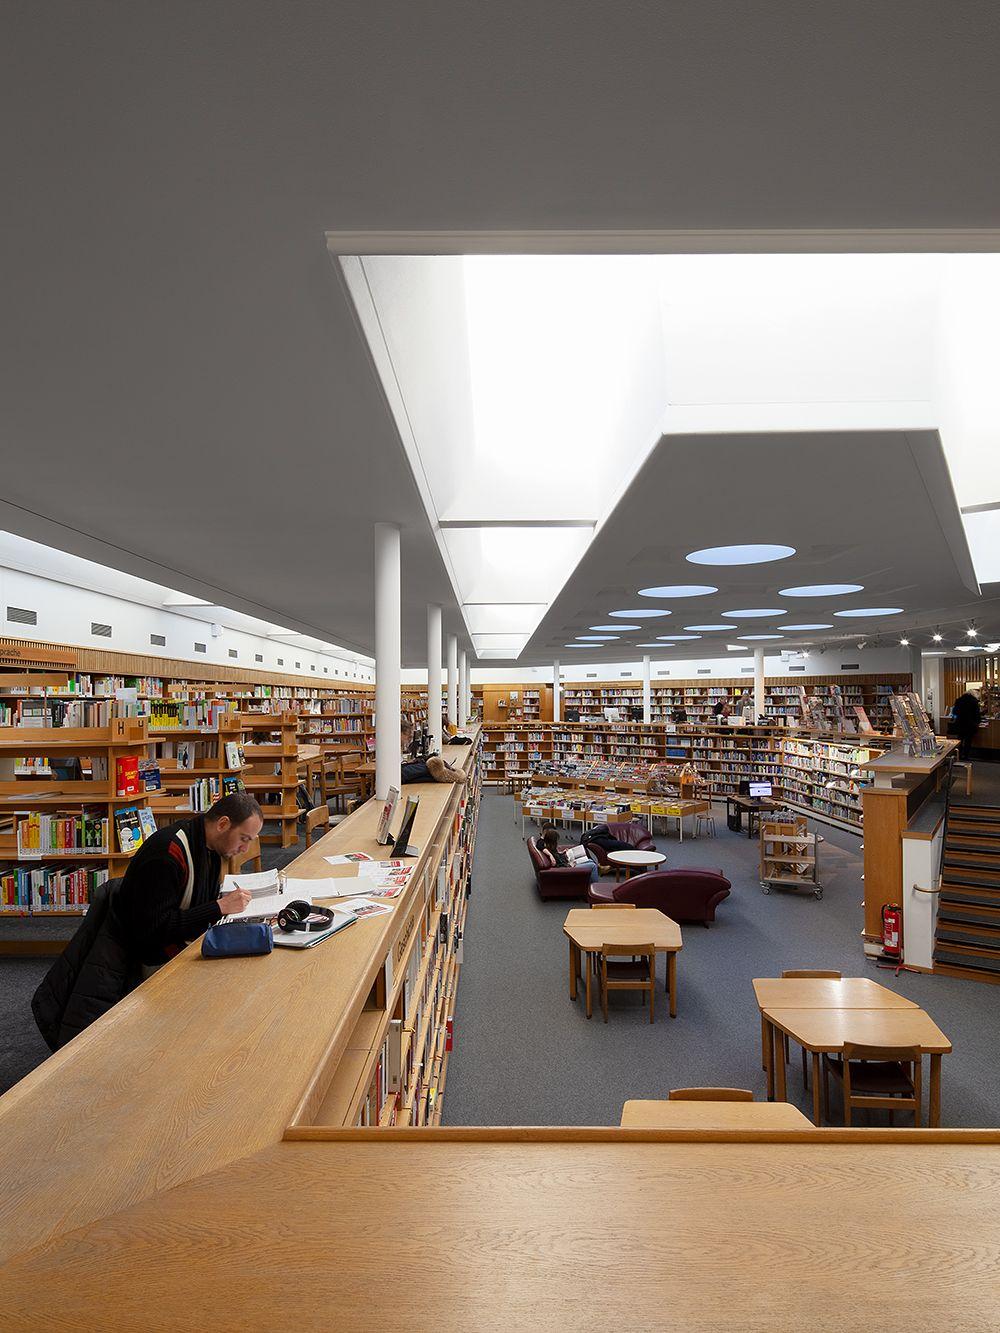 Alvar-Aalto-Kulturhaus, Wolfsburg, library